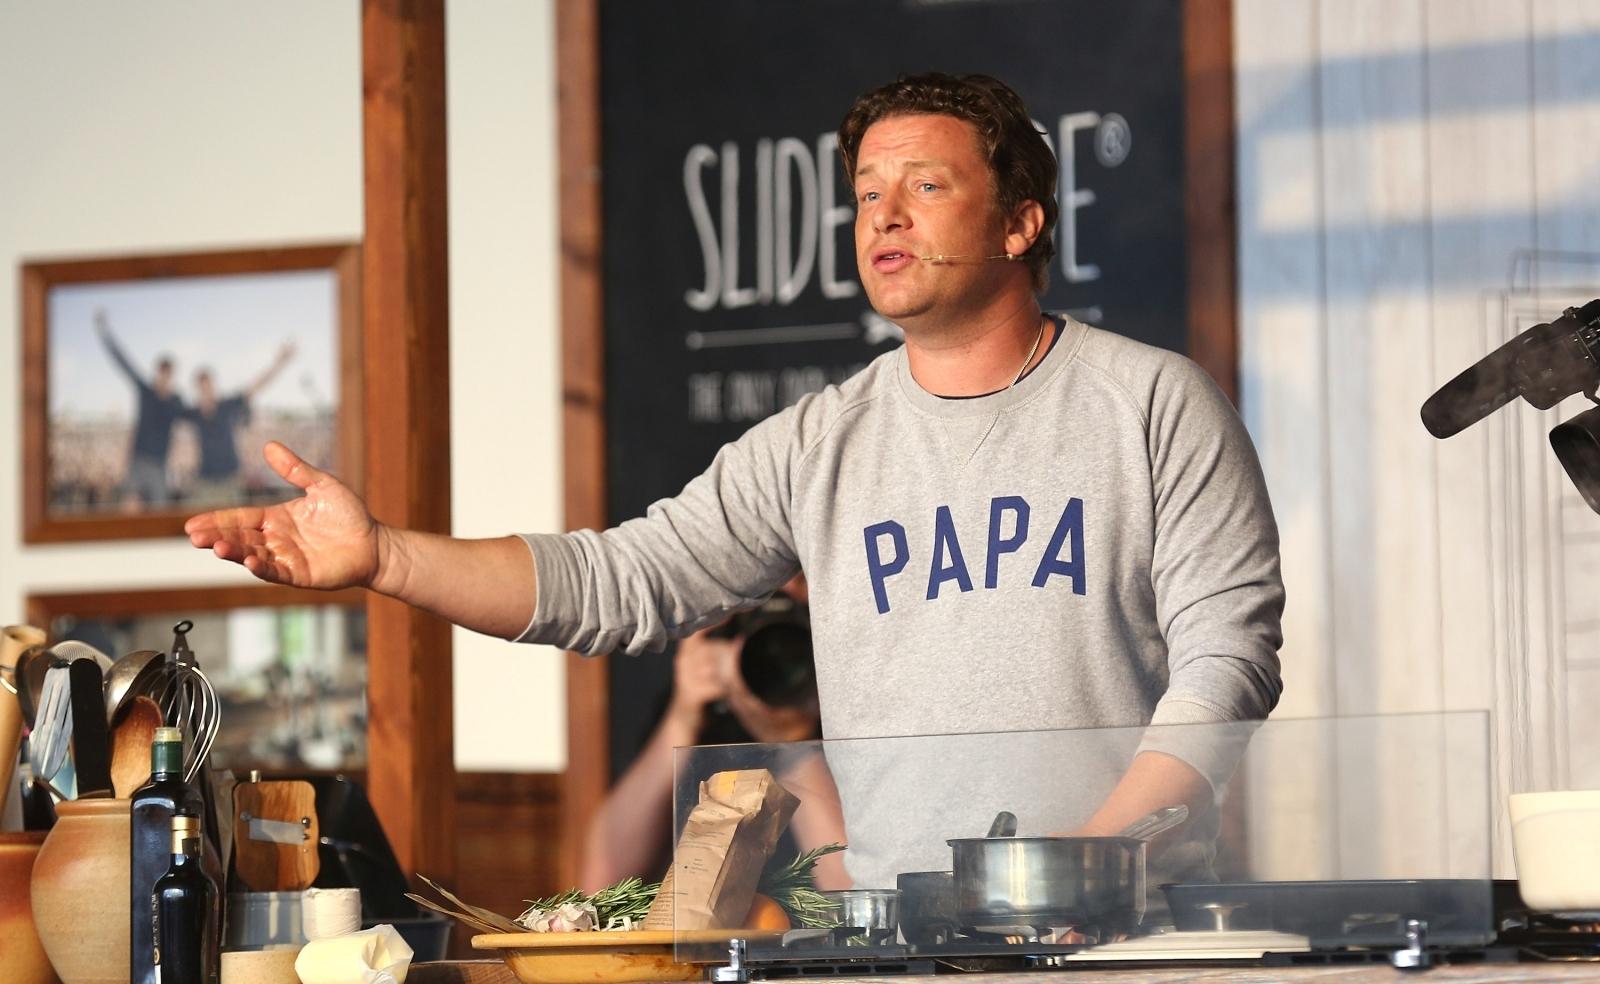 Jamie Oliver on vegans: 'They hate me'